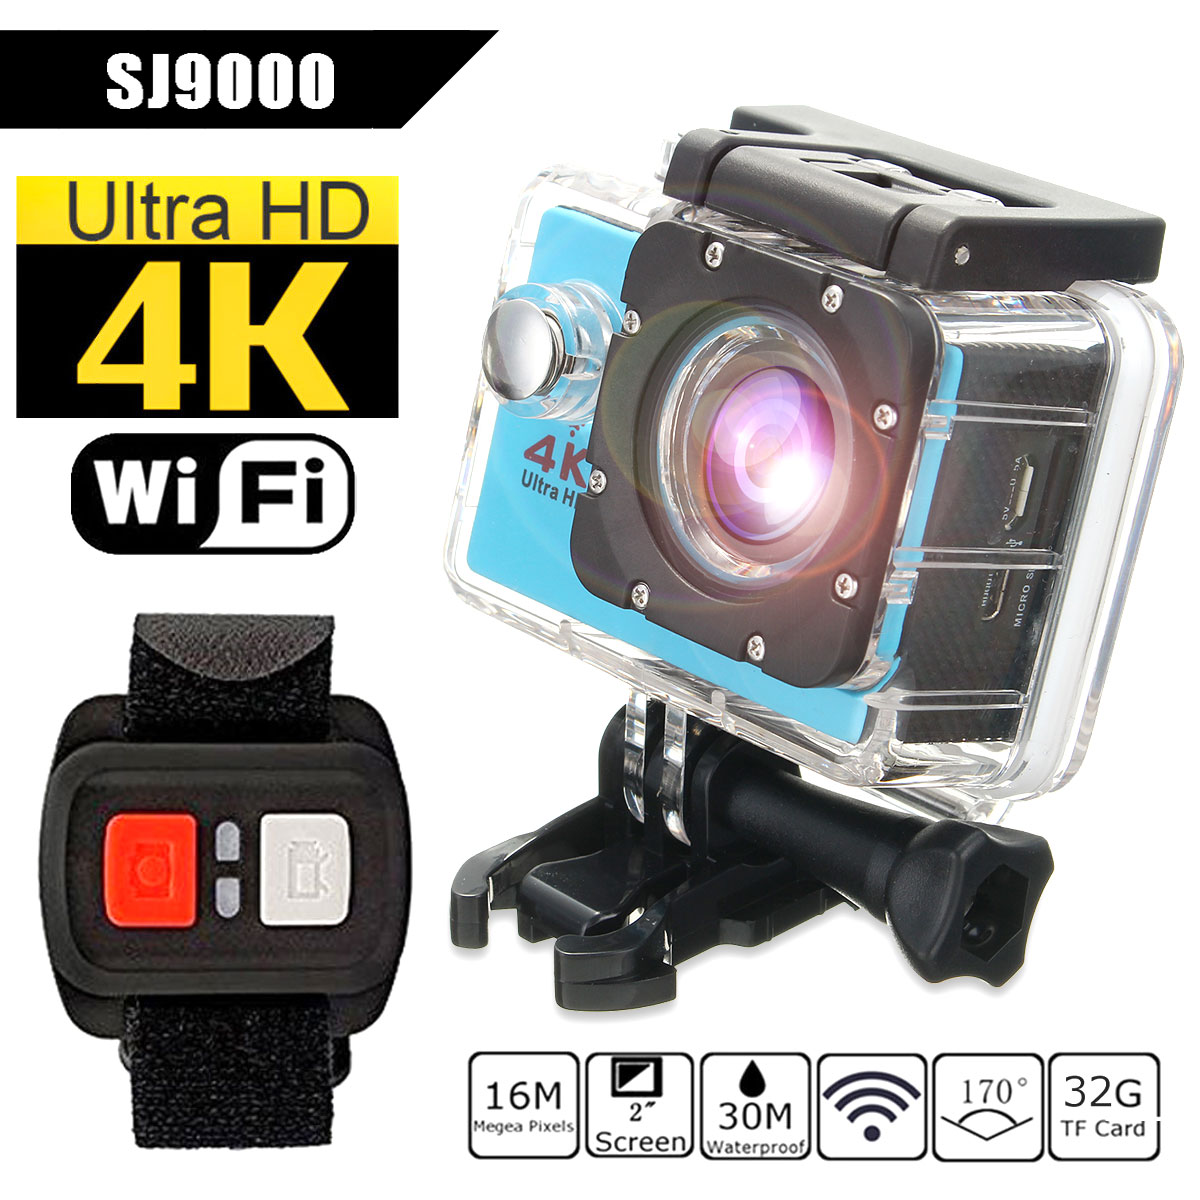 "Waterproof 2.0"" LCD Screen 4K SJ9000 Wifi 1080P HD Sports Action Camera DVR Cam Camcorder"